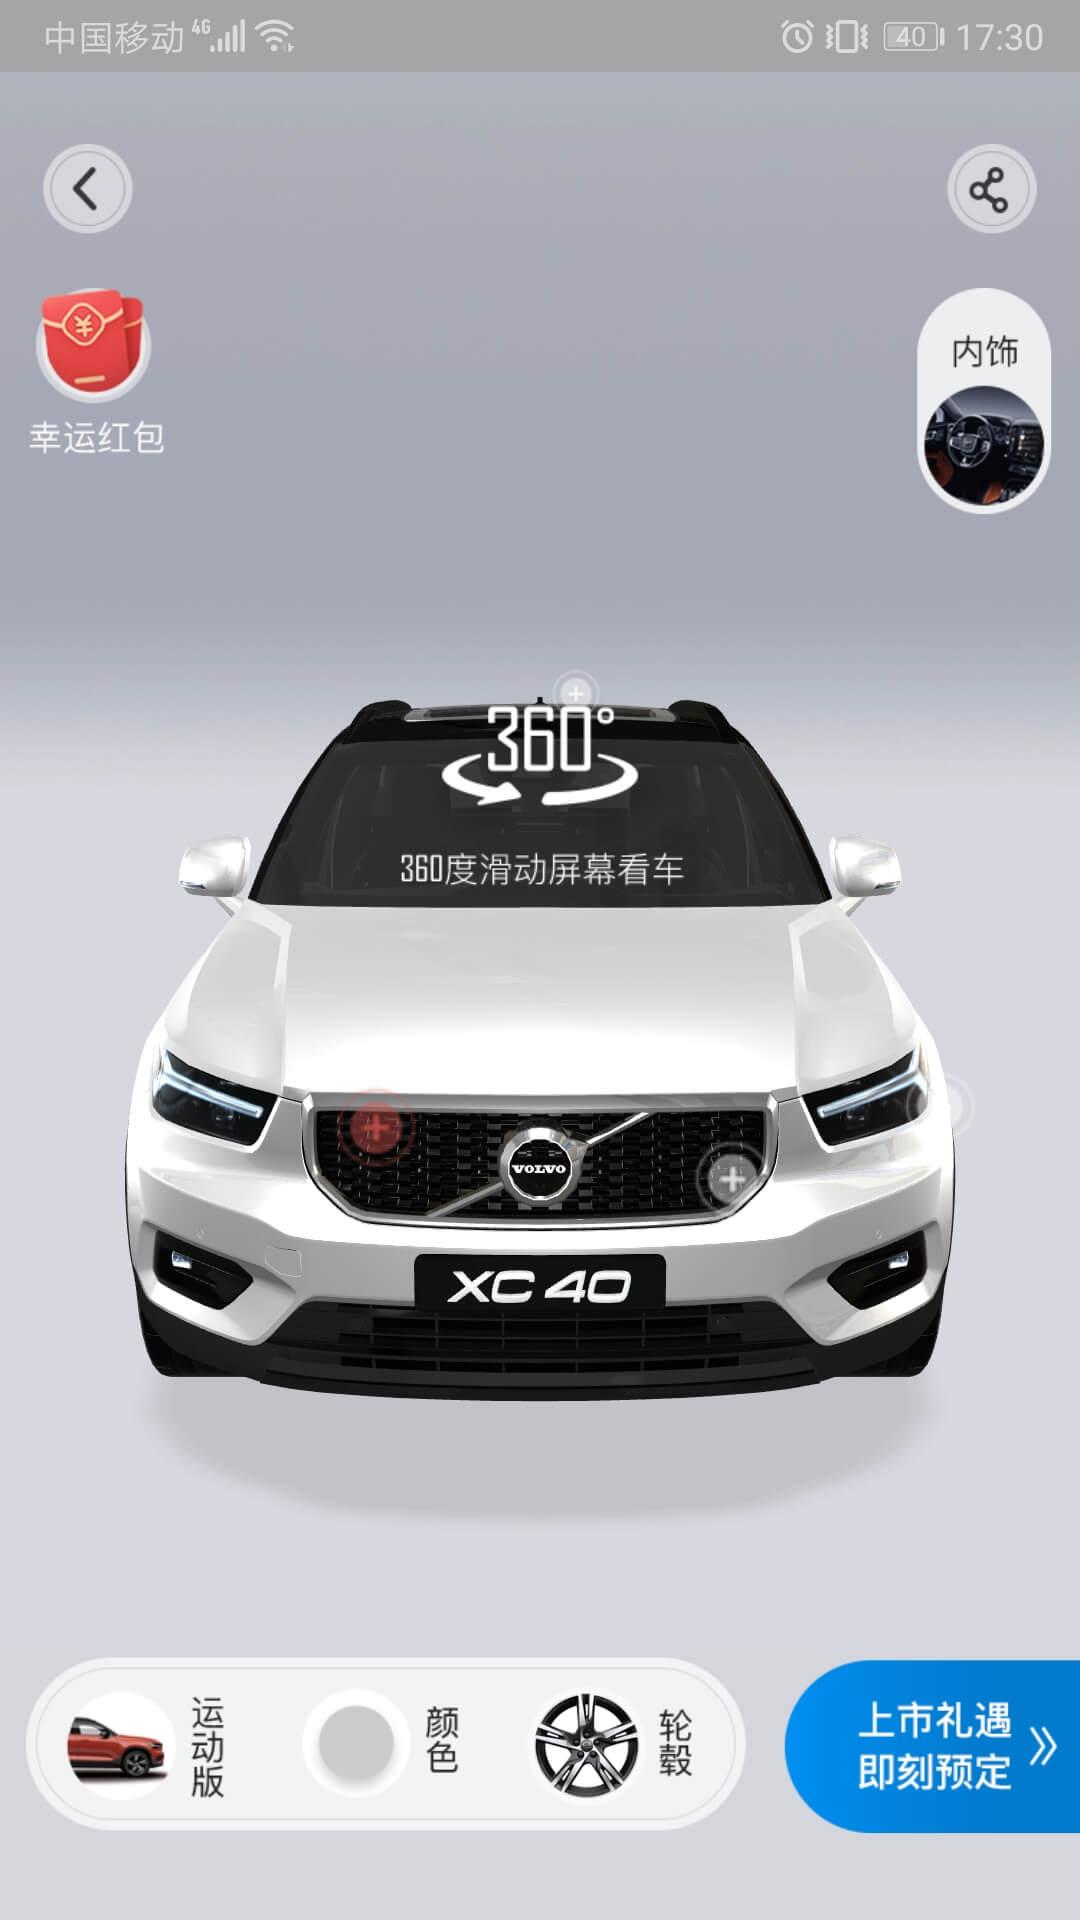 Screenshot_20190524_173036_com.taobao.taobao.jpg